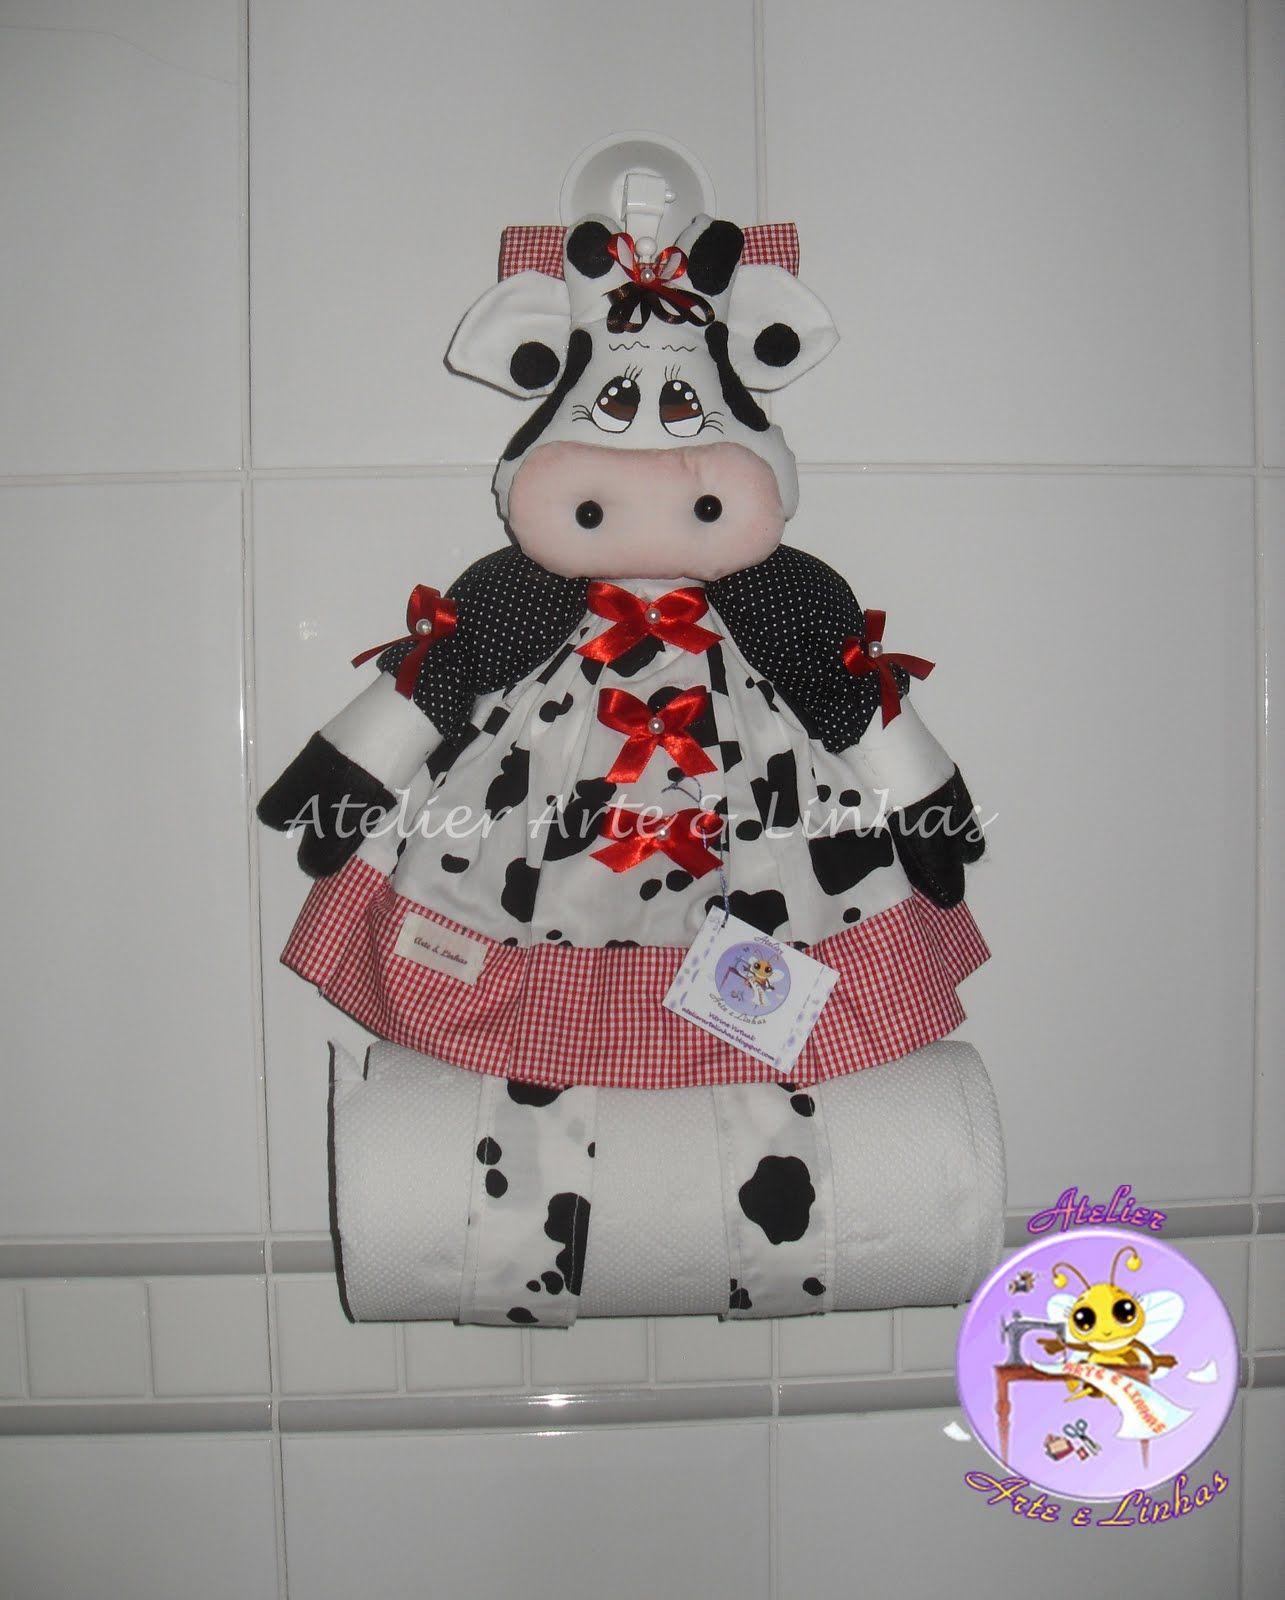 vaquita porta rollo | decoracion para cosina | Pinterest | Vaca ...